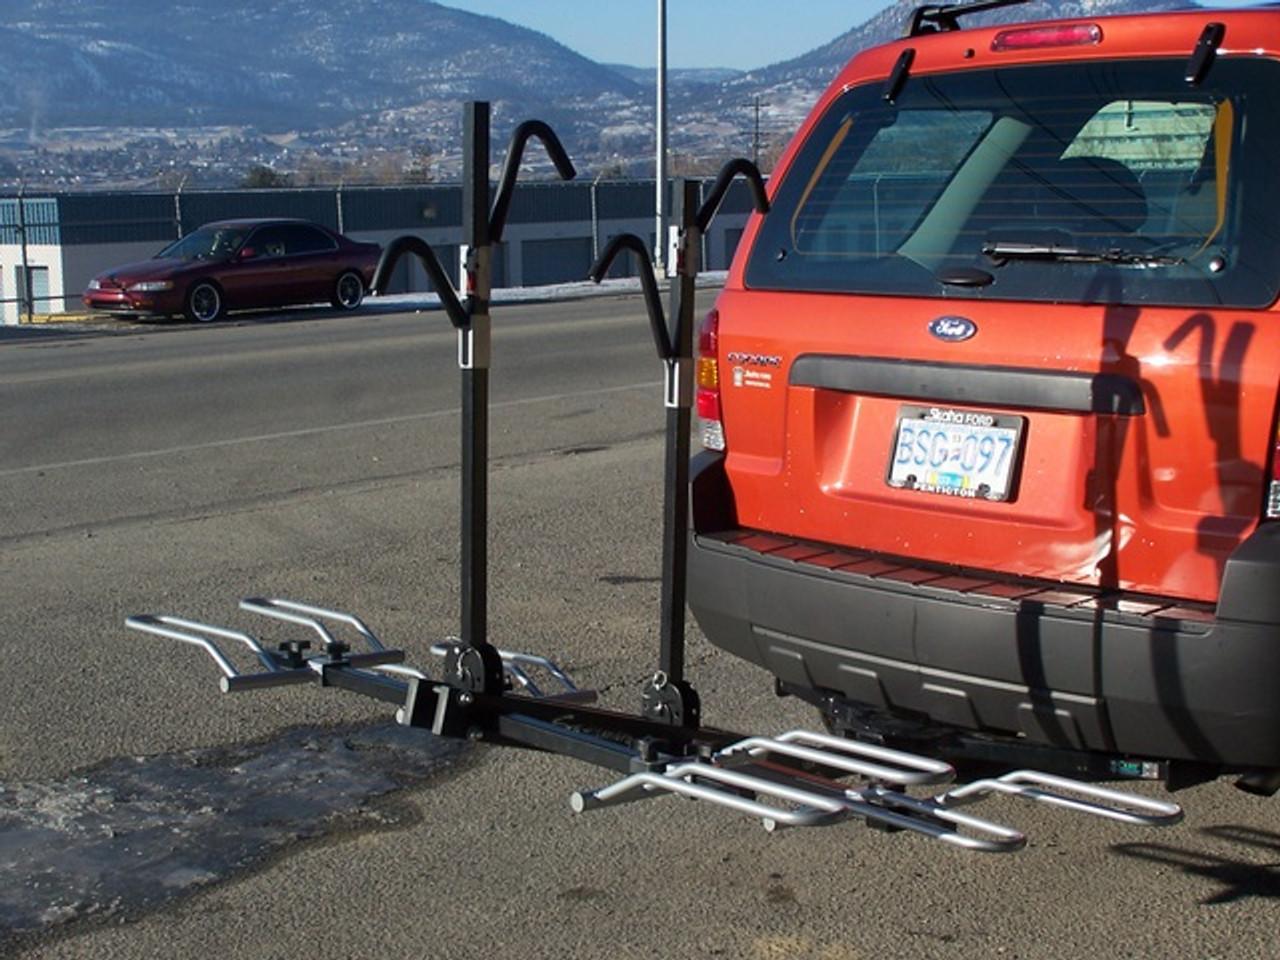 swagman xtc 4 hitch bike rack